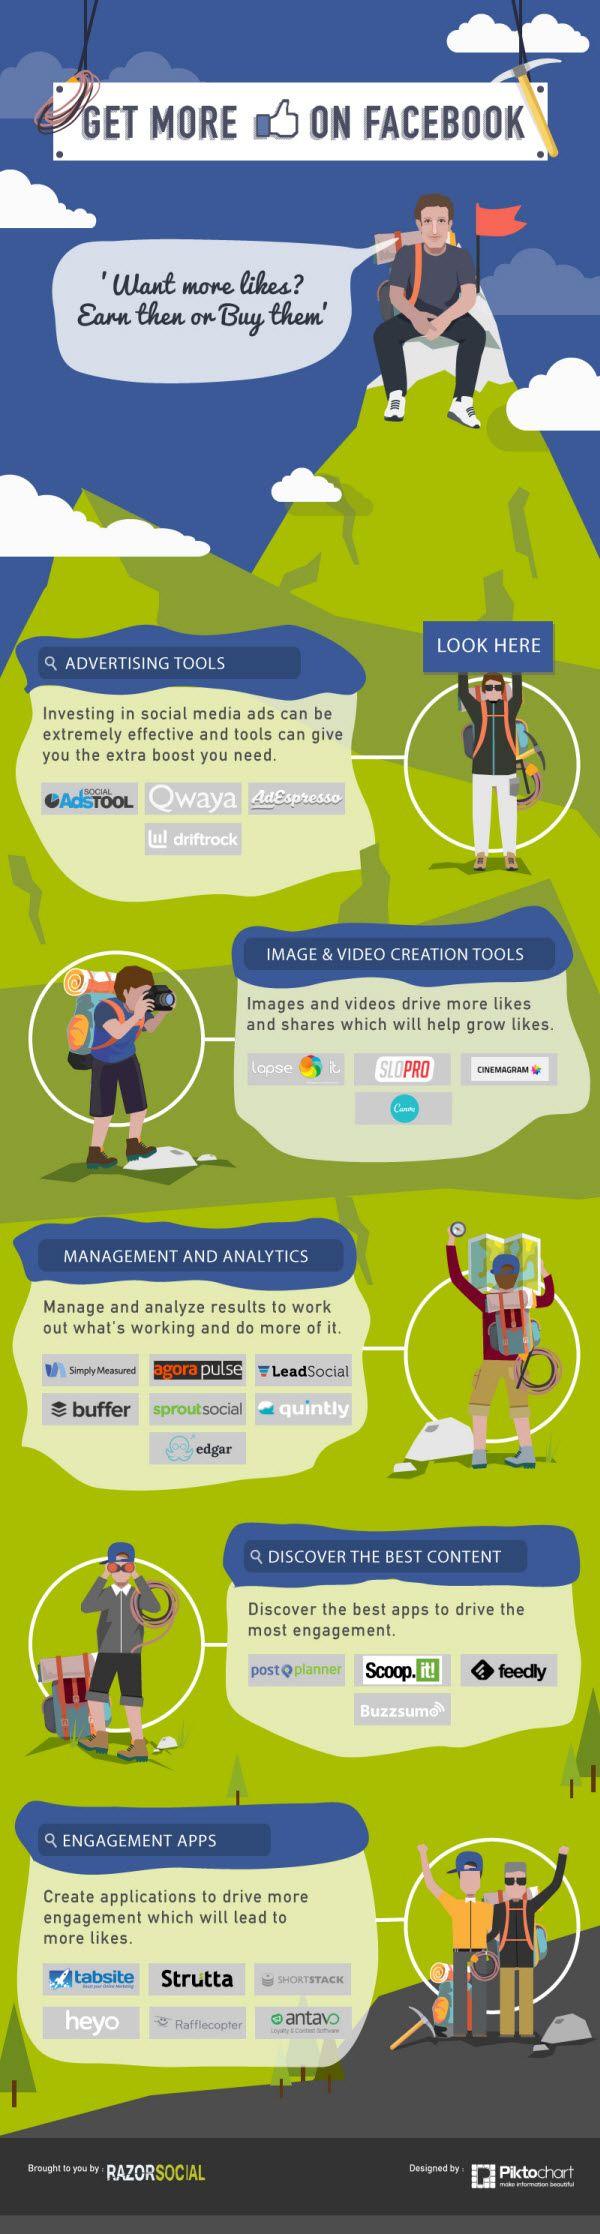 25 Facebook Tools Marketers Should Consider - infographic (scheduled via http://www.tailwindapp.com?utm_source=pinterest&utm_medium=twpin&utm_content=post20799806&utm_campaign=scheduler_attribution)